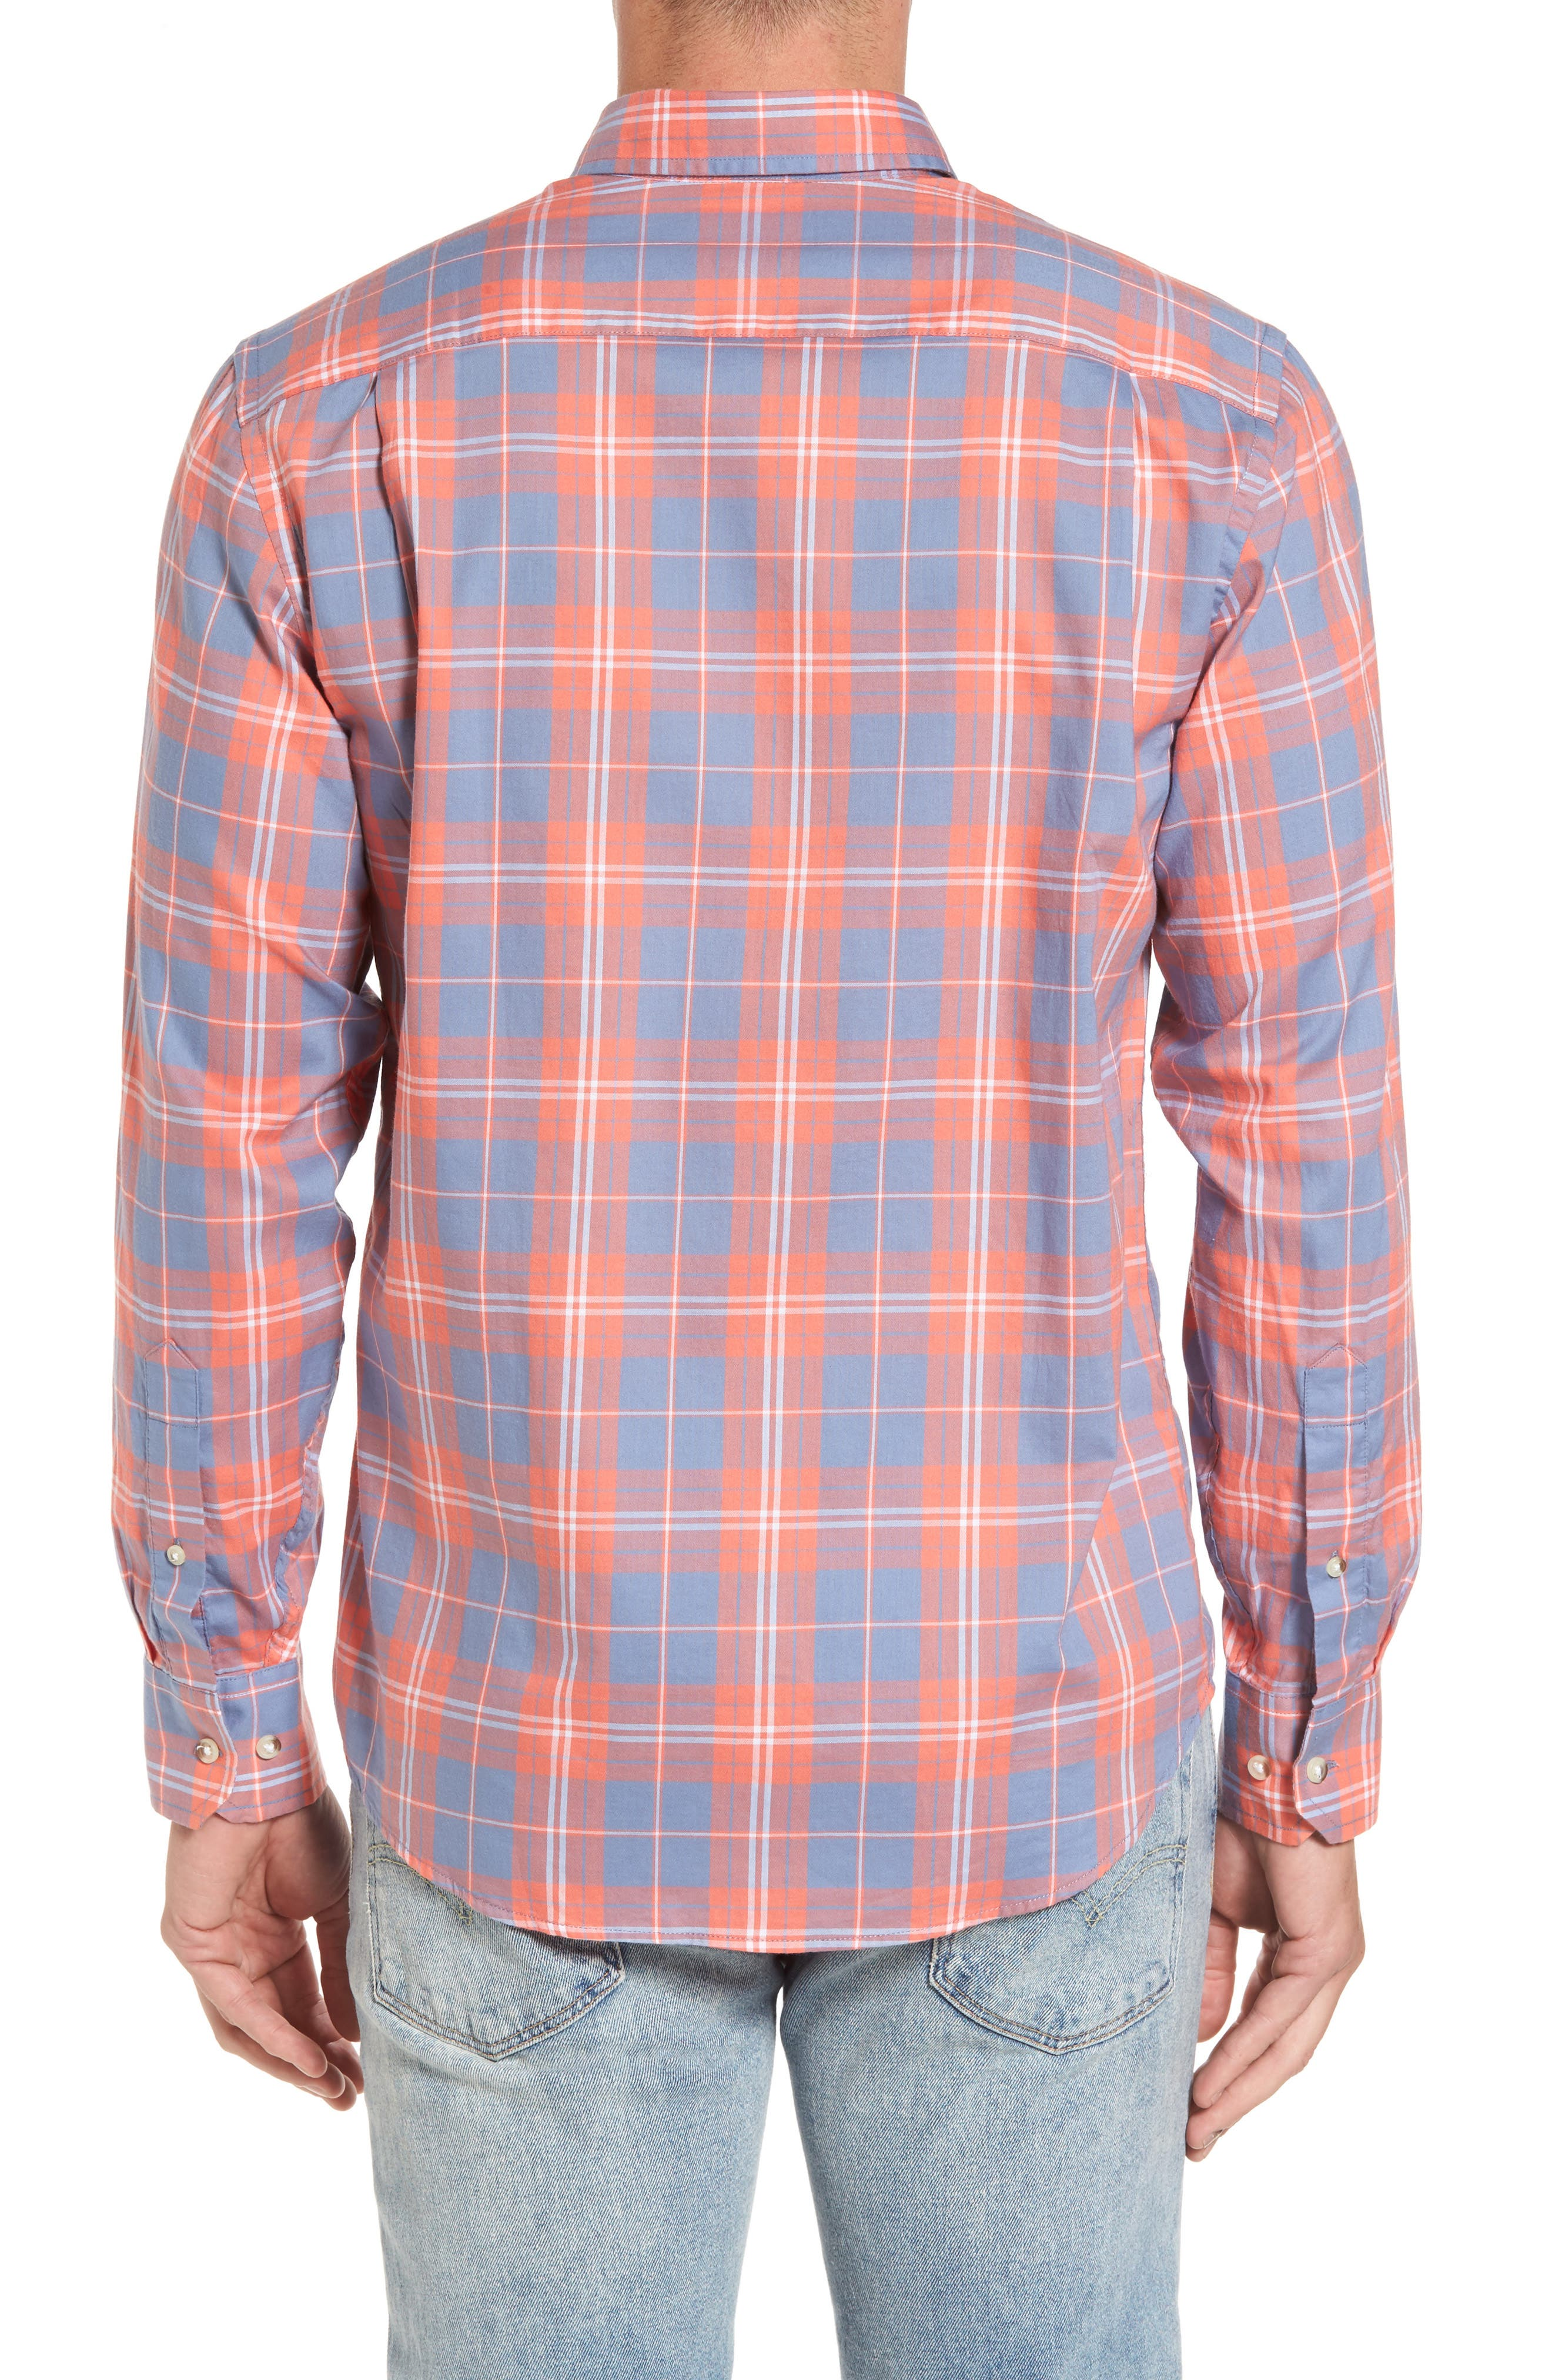 Charleston Station Slim Fit Plaid Sport Shirt,                             Alternate thumbnail 2, color,